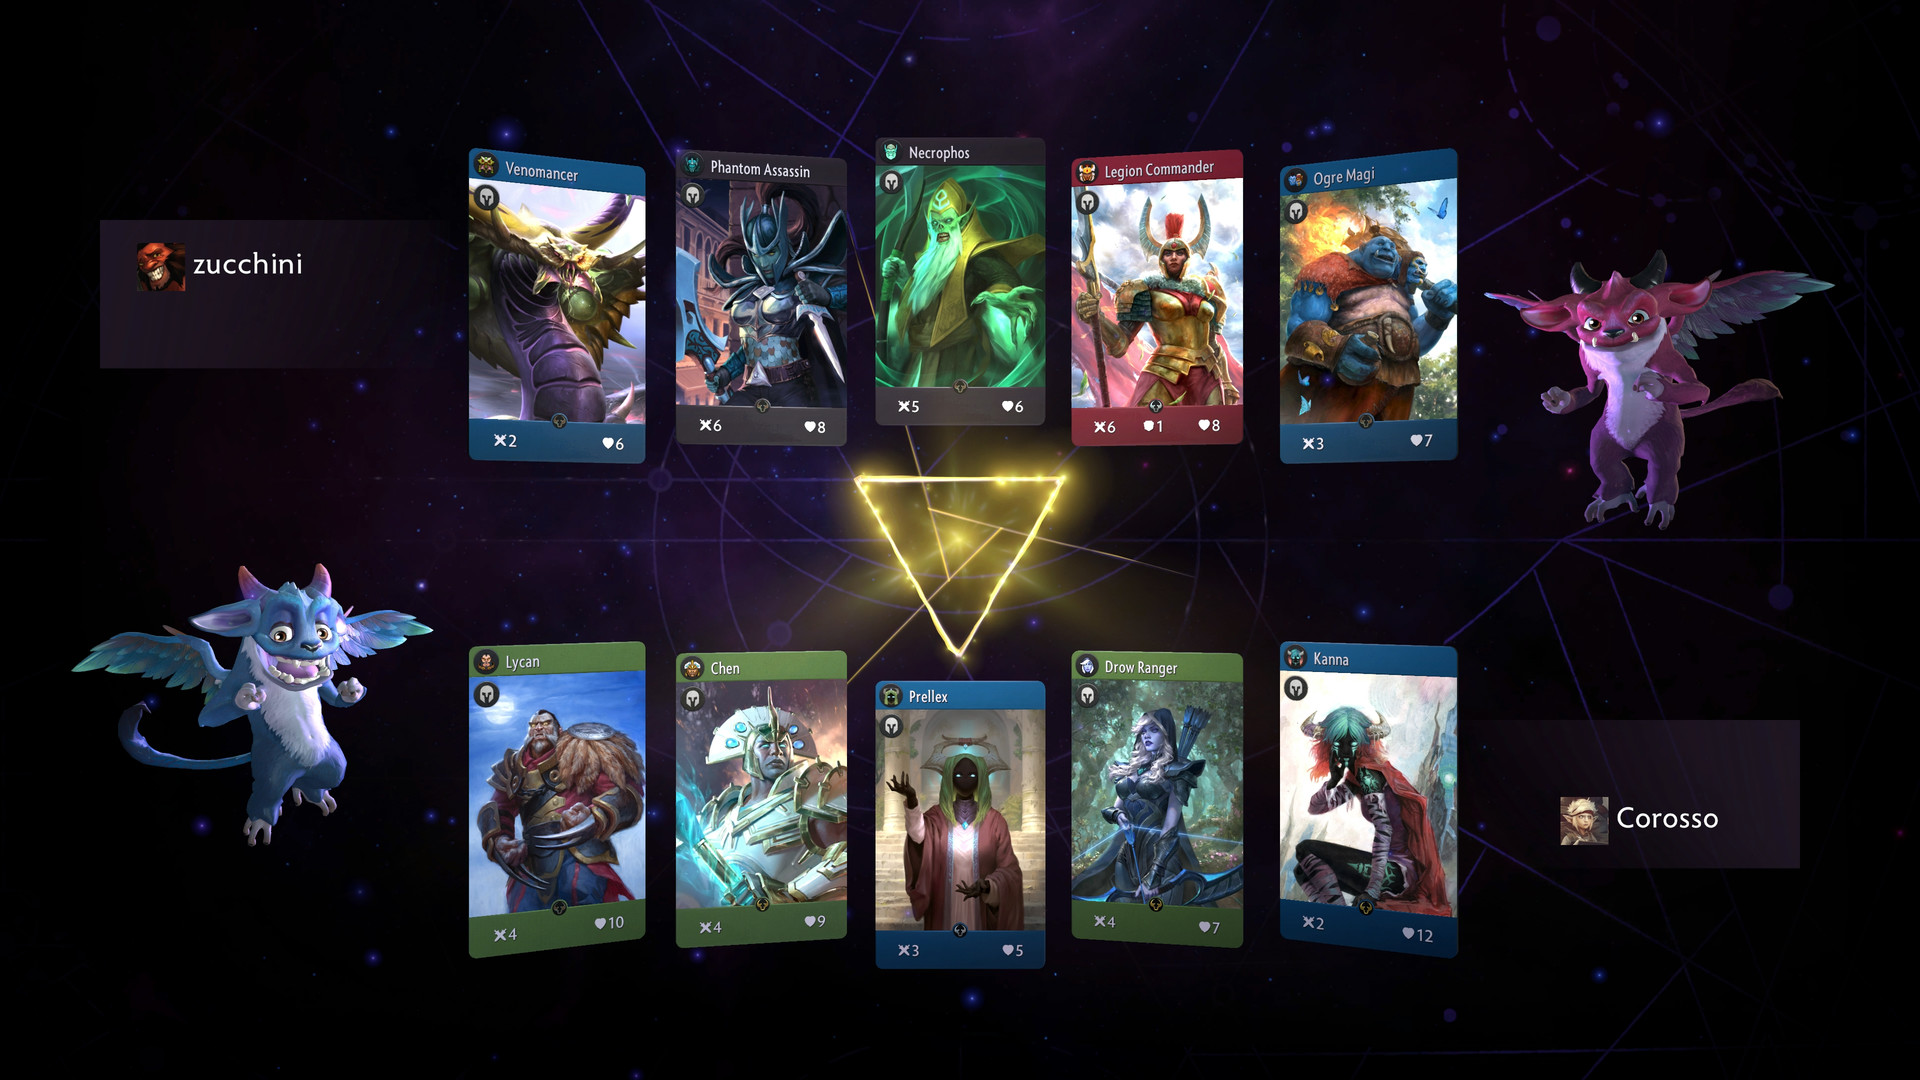 《Artifact》设计师表示游戏还能被拯救 关键在于V社是否努力